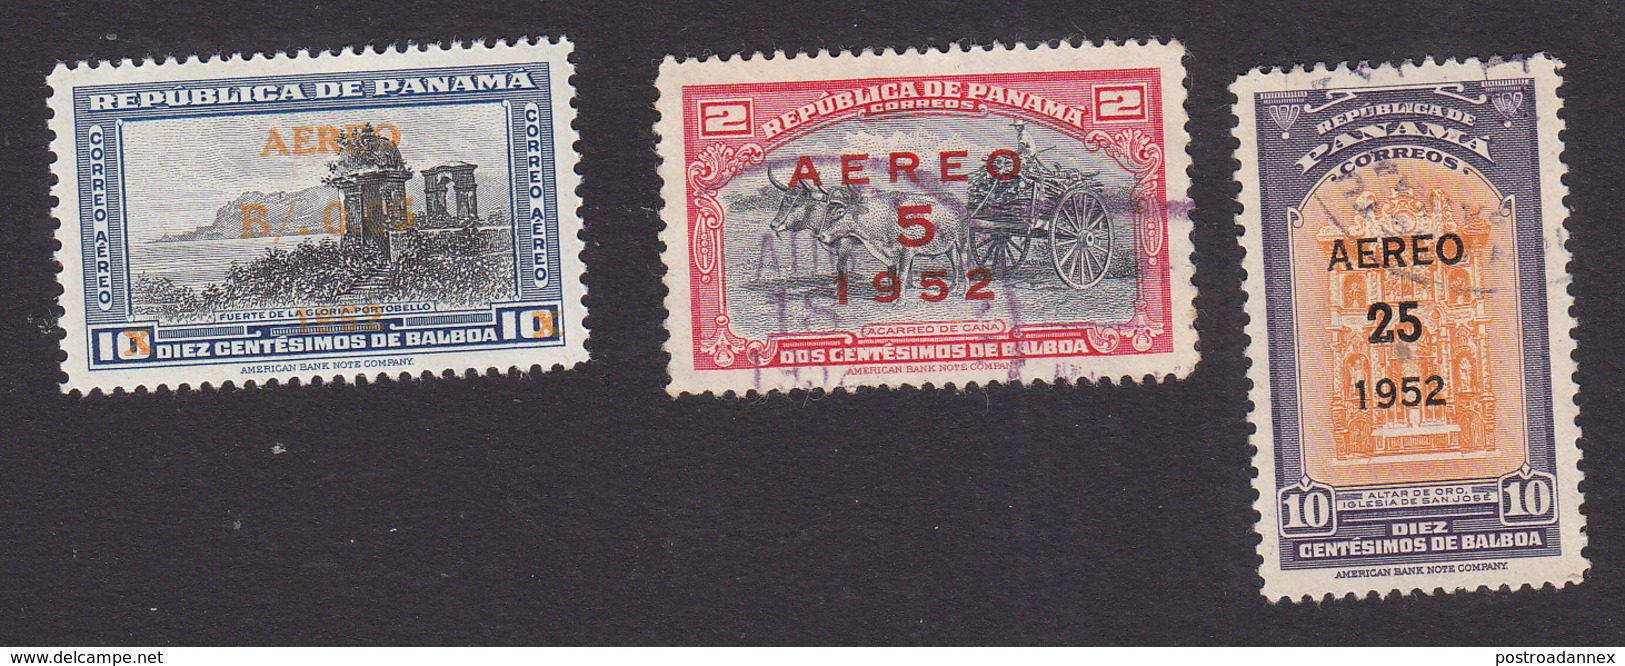 Panama, Scott #C127, C129-C130, Mint Hinged/Used, Scenes Of Panama Surcharged, Issued 1952 - Panama